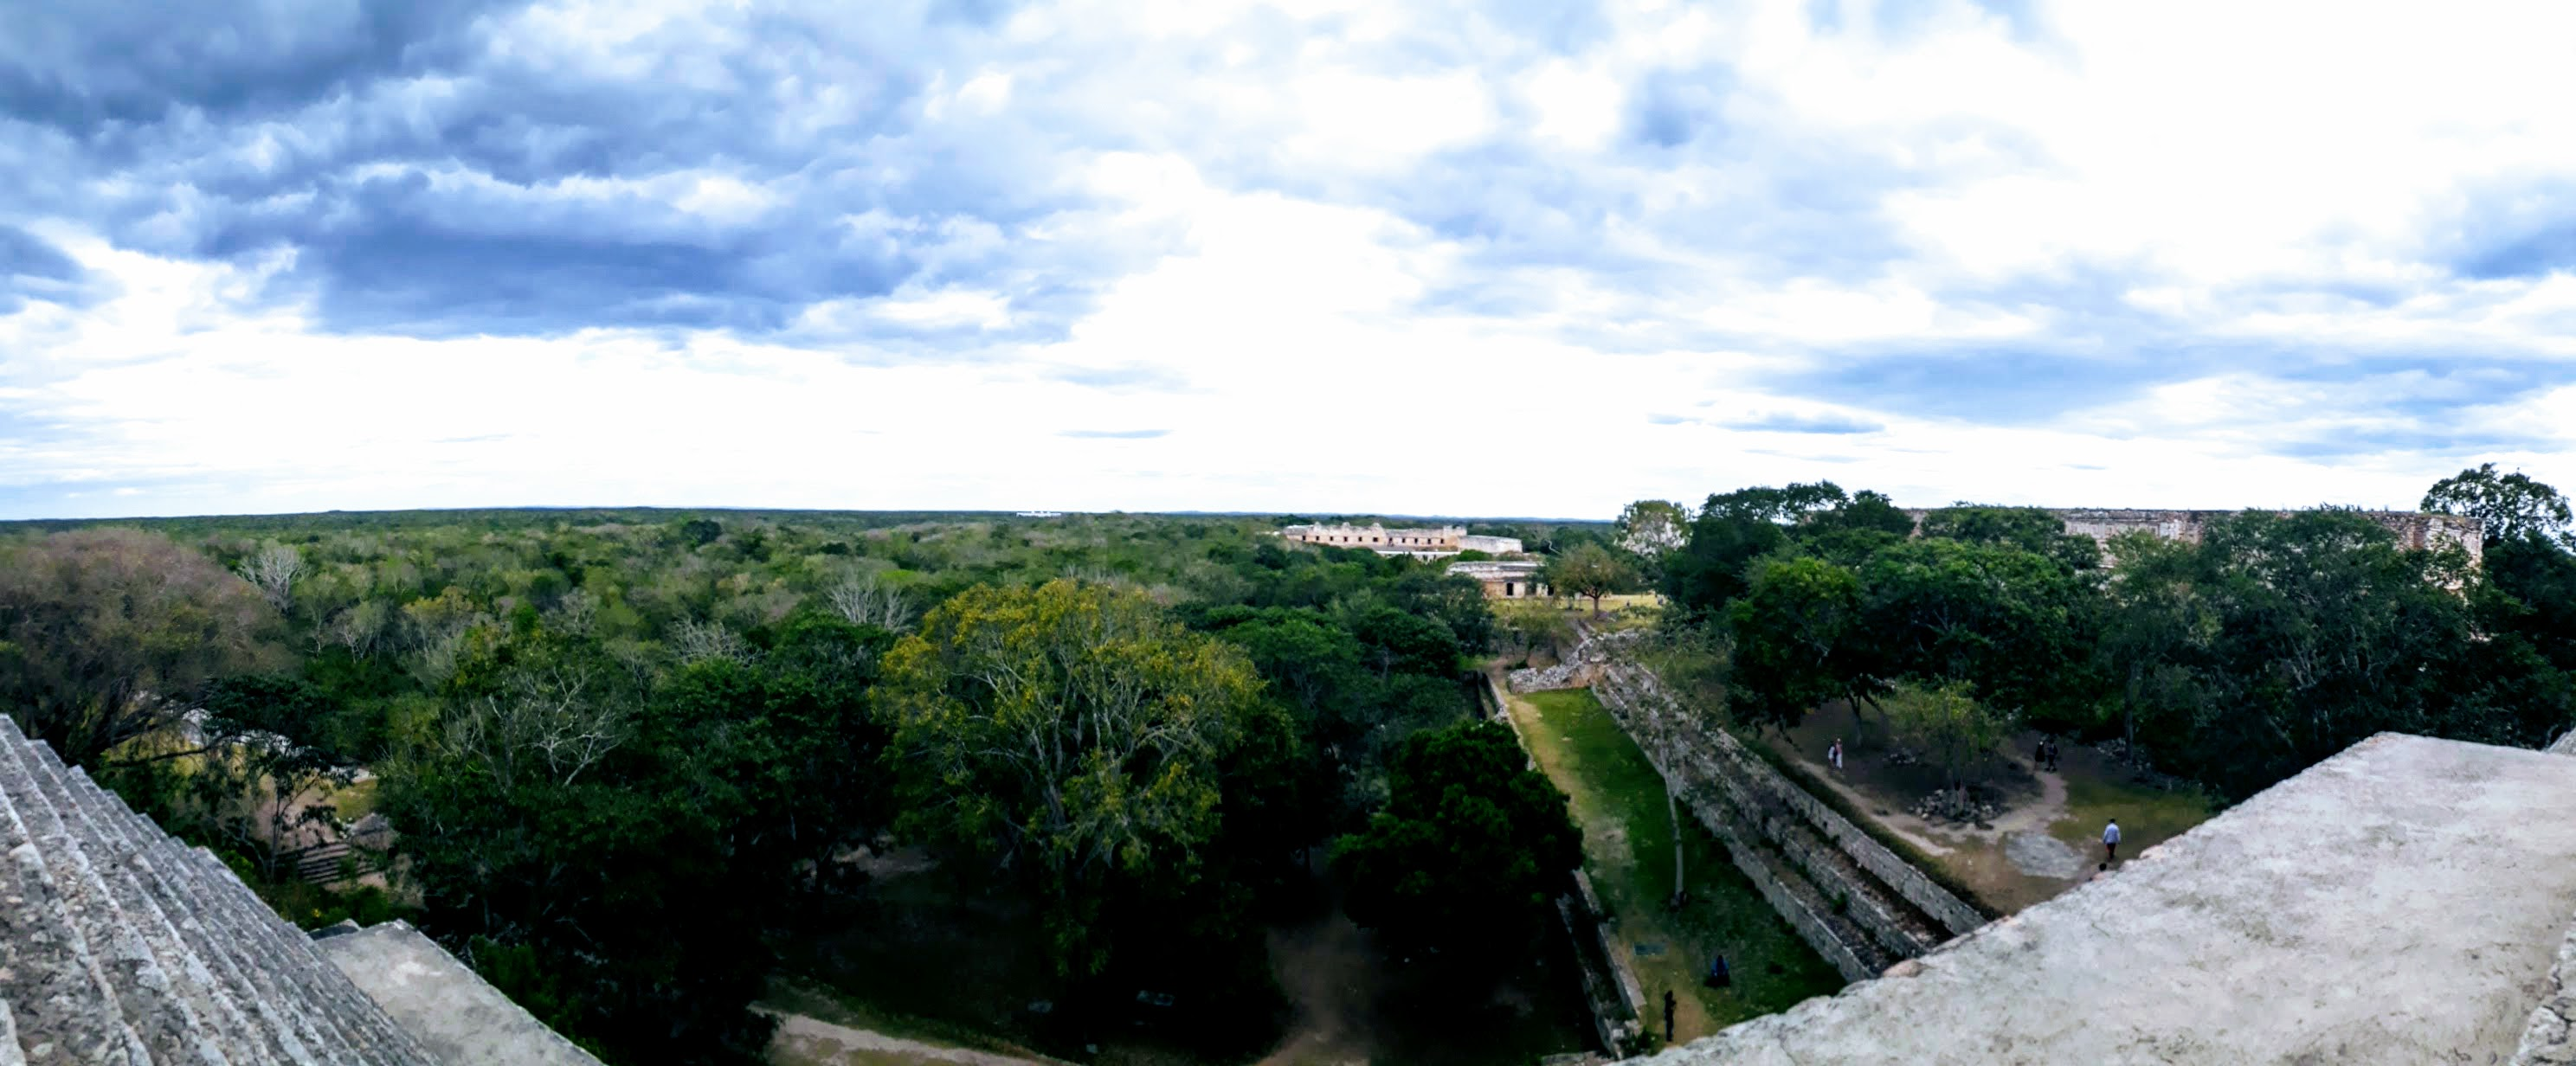 ruta puuc uxmal mayan ruins yucatan mexico ikigai travel